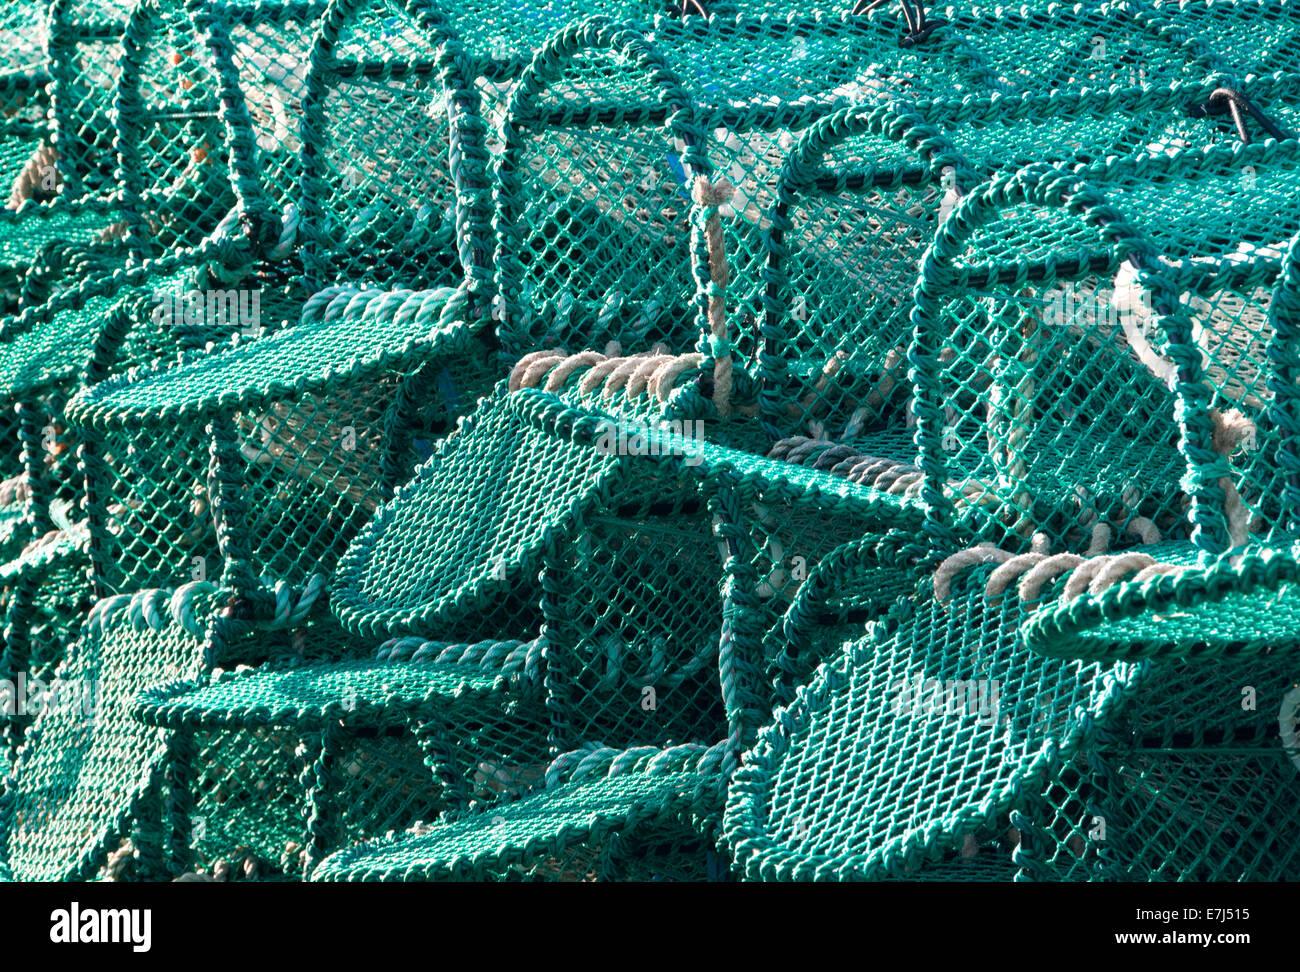 Lobster Pots on Lindisfarne or Holy Island, Northumberland, England, UK - Stock Image